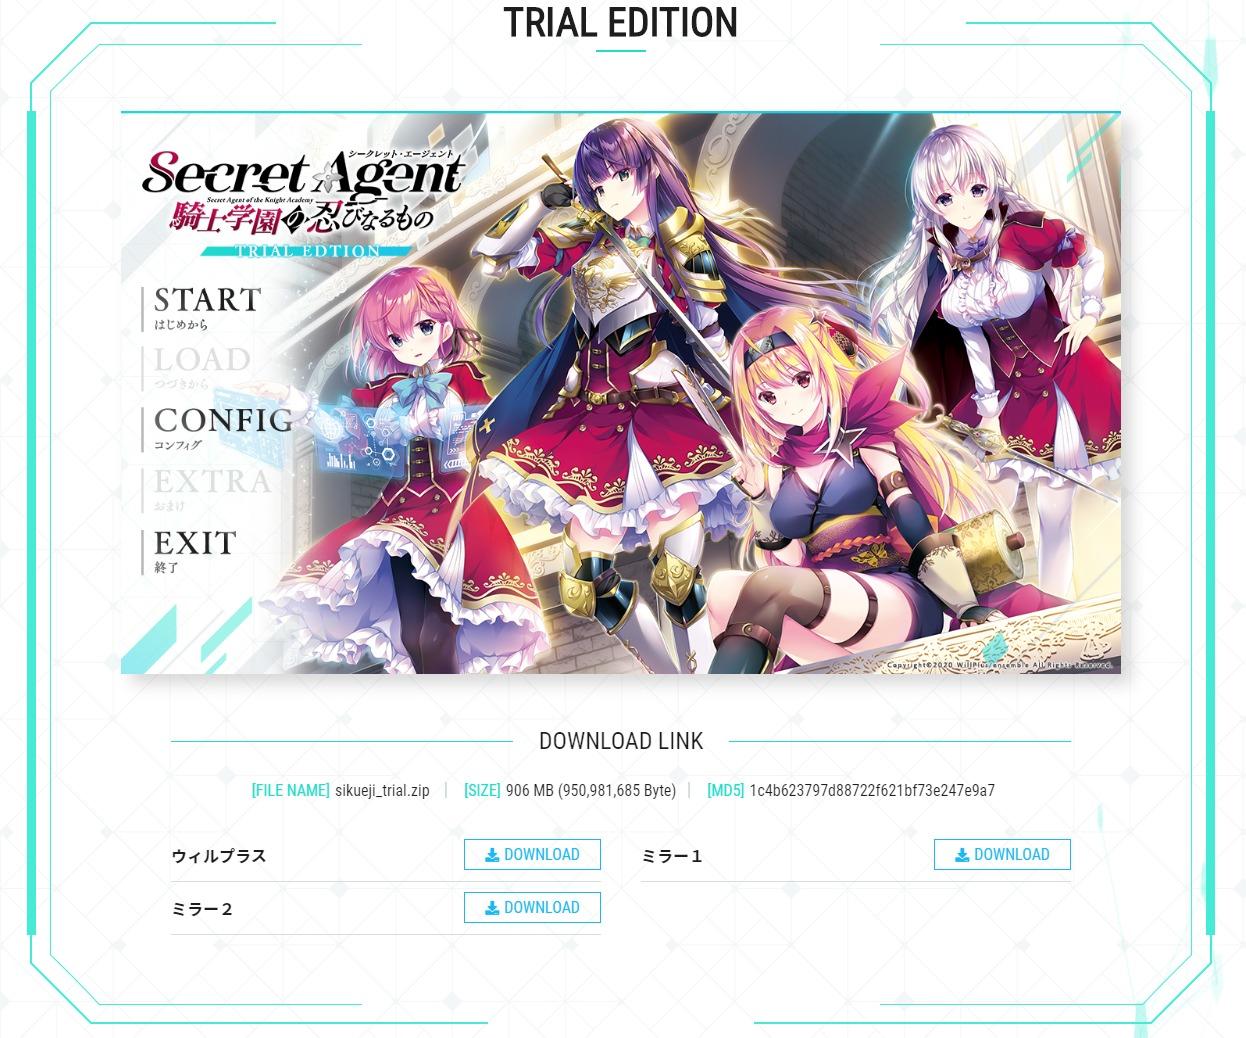 Secret Agent〜騎士学園の忍びなるもの〜 DOWNLOAD